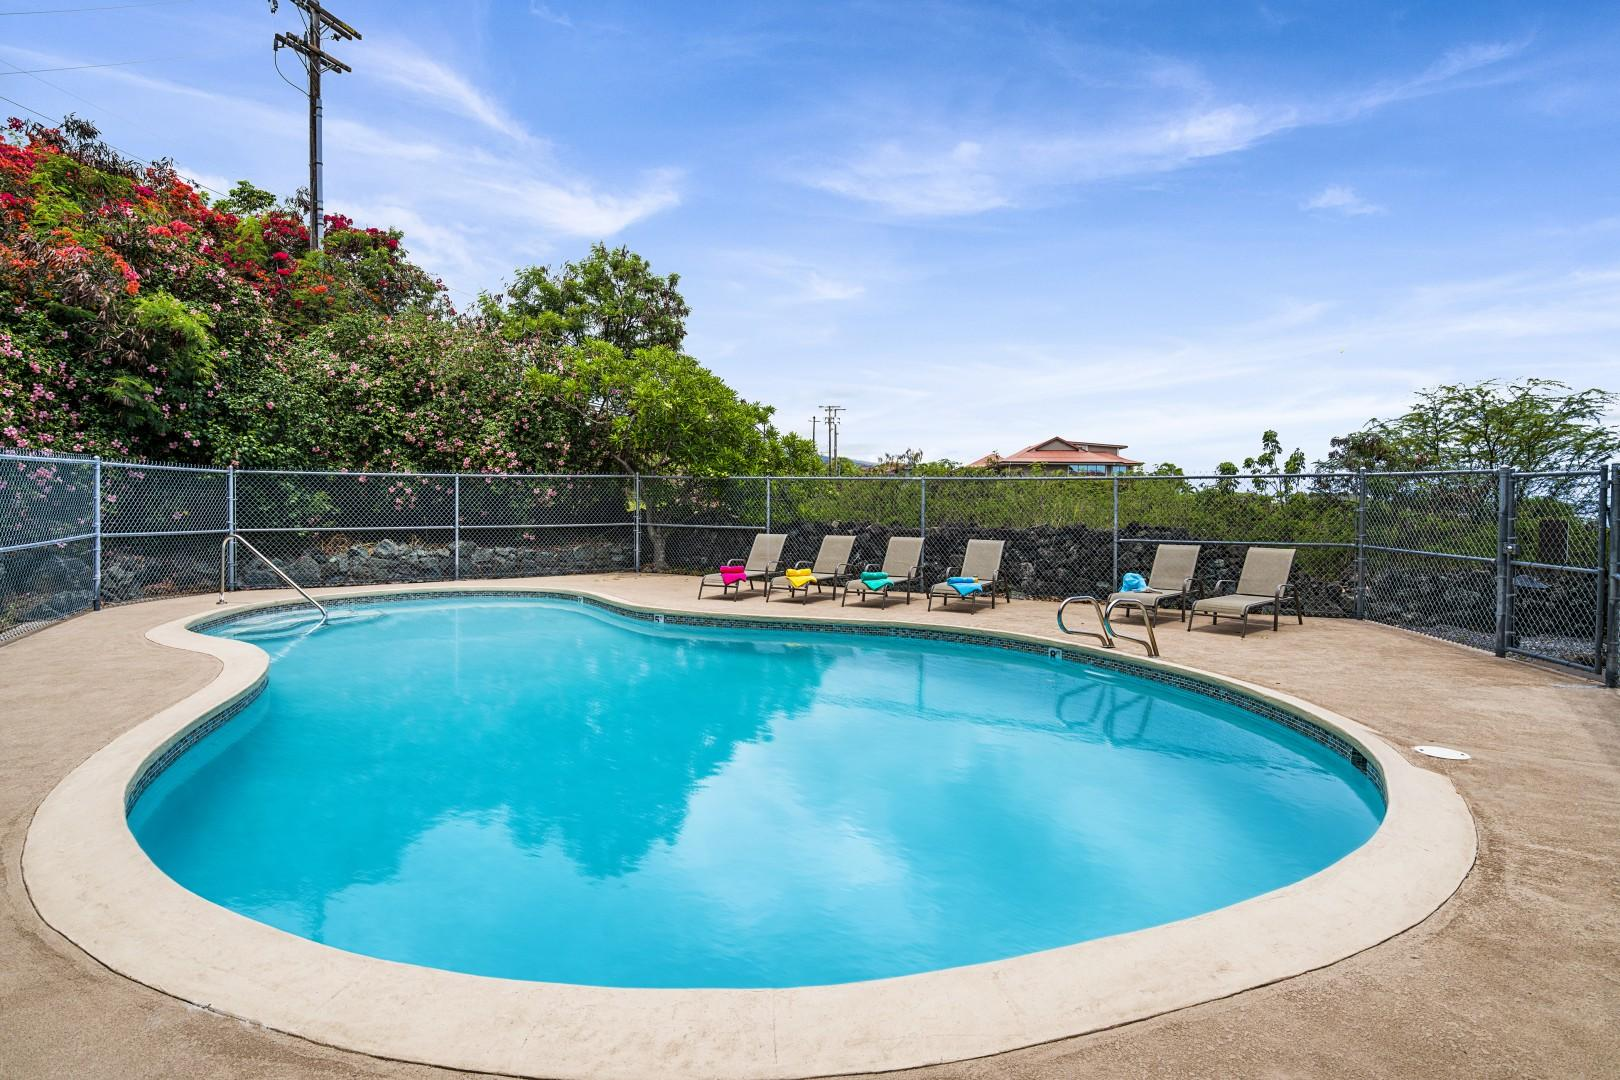 Lounge pool side!